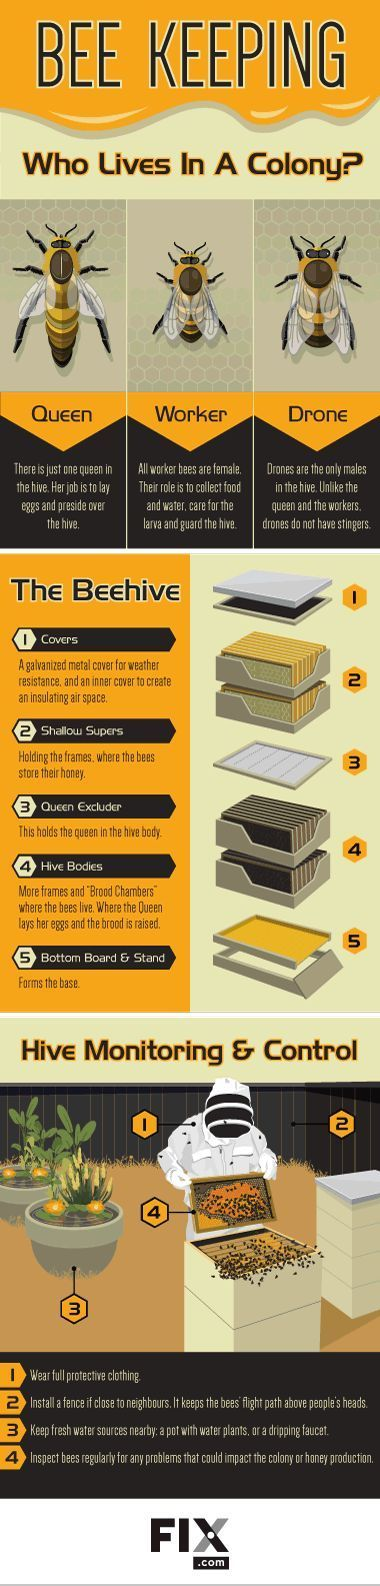 Best Backyard Beekeeping Ideas On Pinterest Beekeeping Bee - Backyard beekeeping for beginners